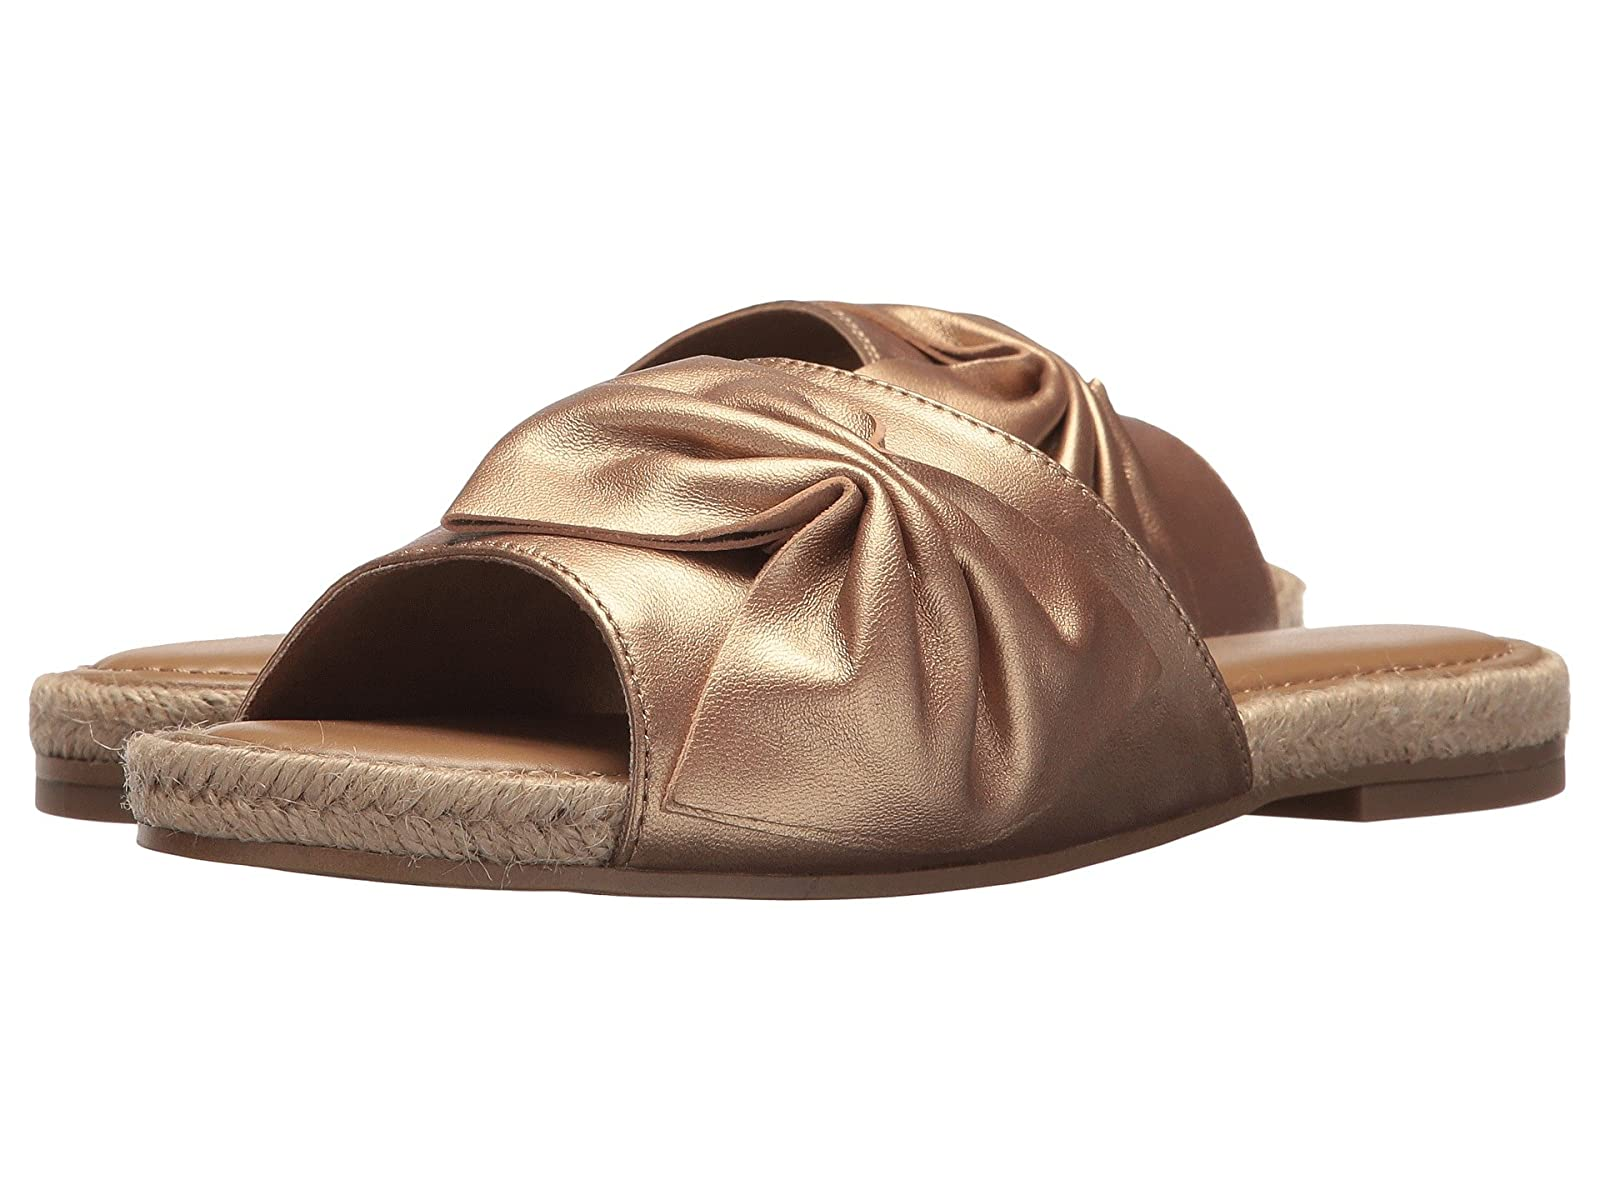 Aerosoles ButtercupAtmospheric grades have affordable shoes